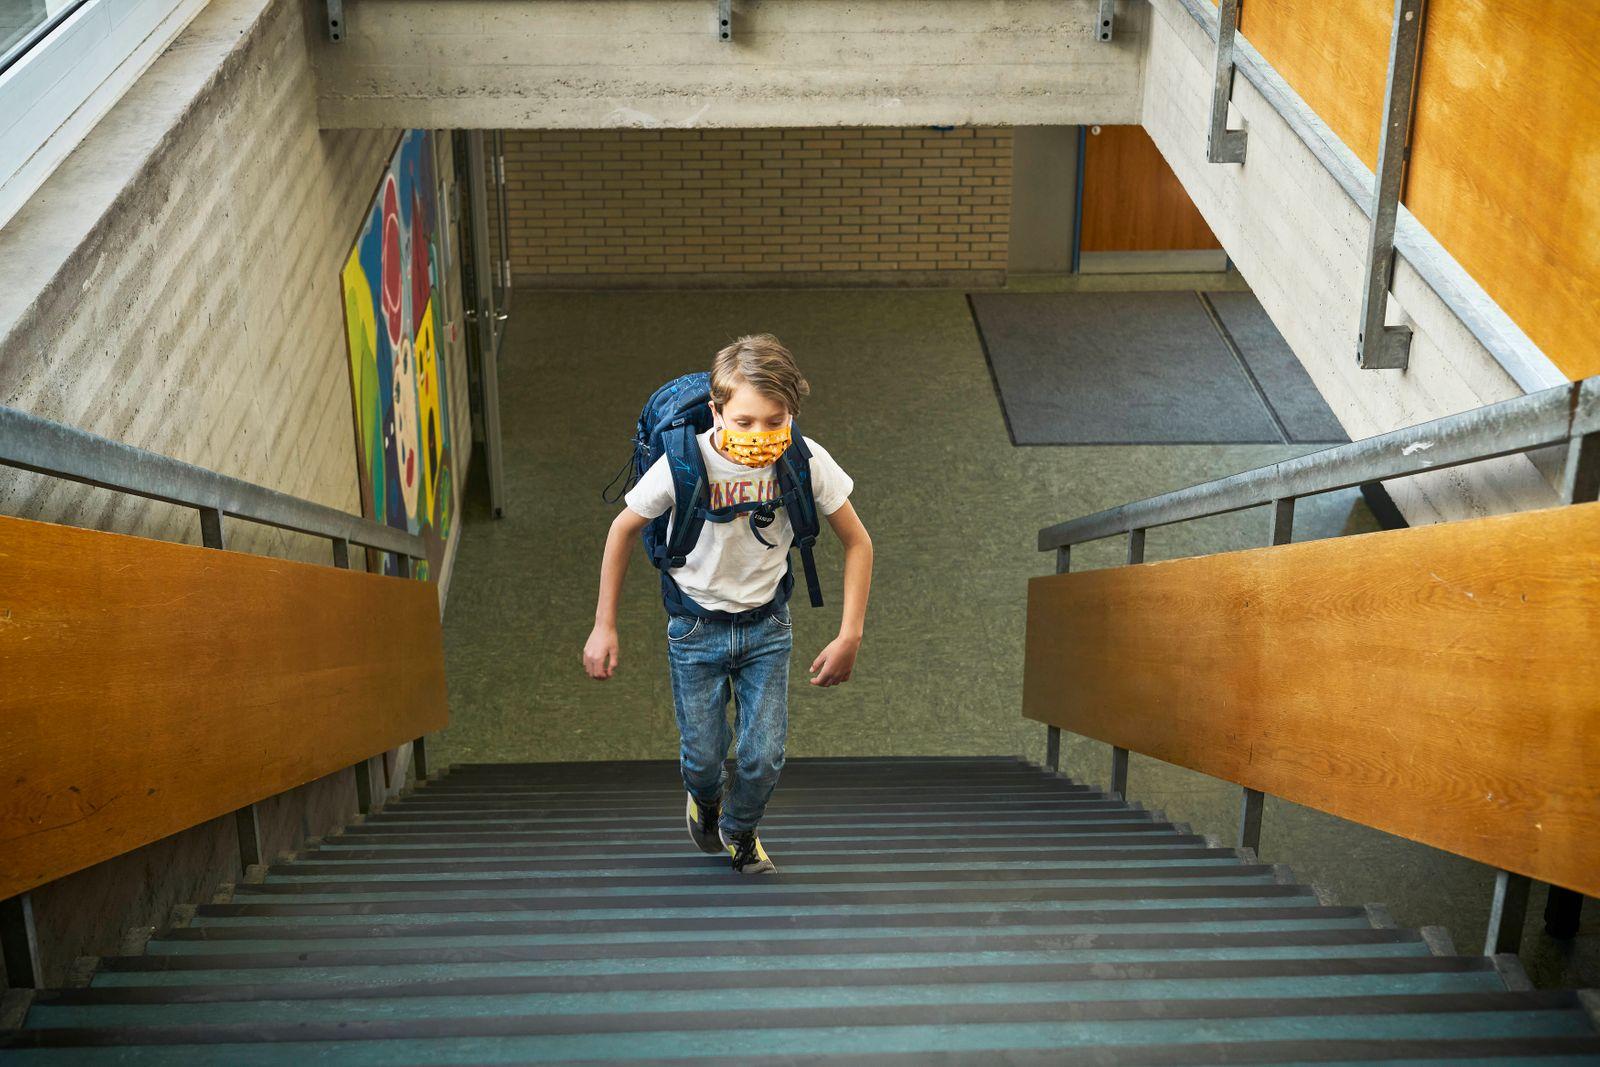 Boy wearing mask in school walking up stairs model released Symbolfoto property released DIKF00510